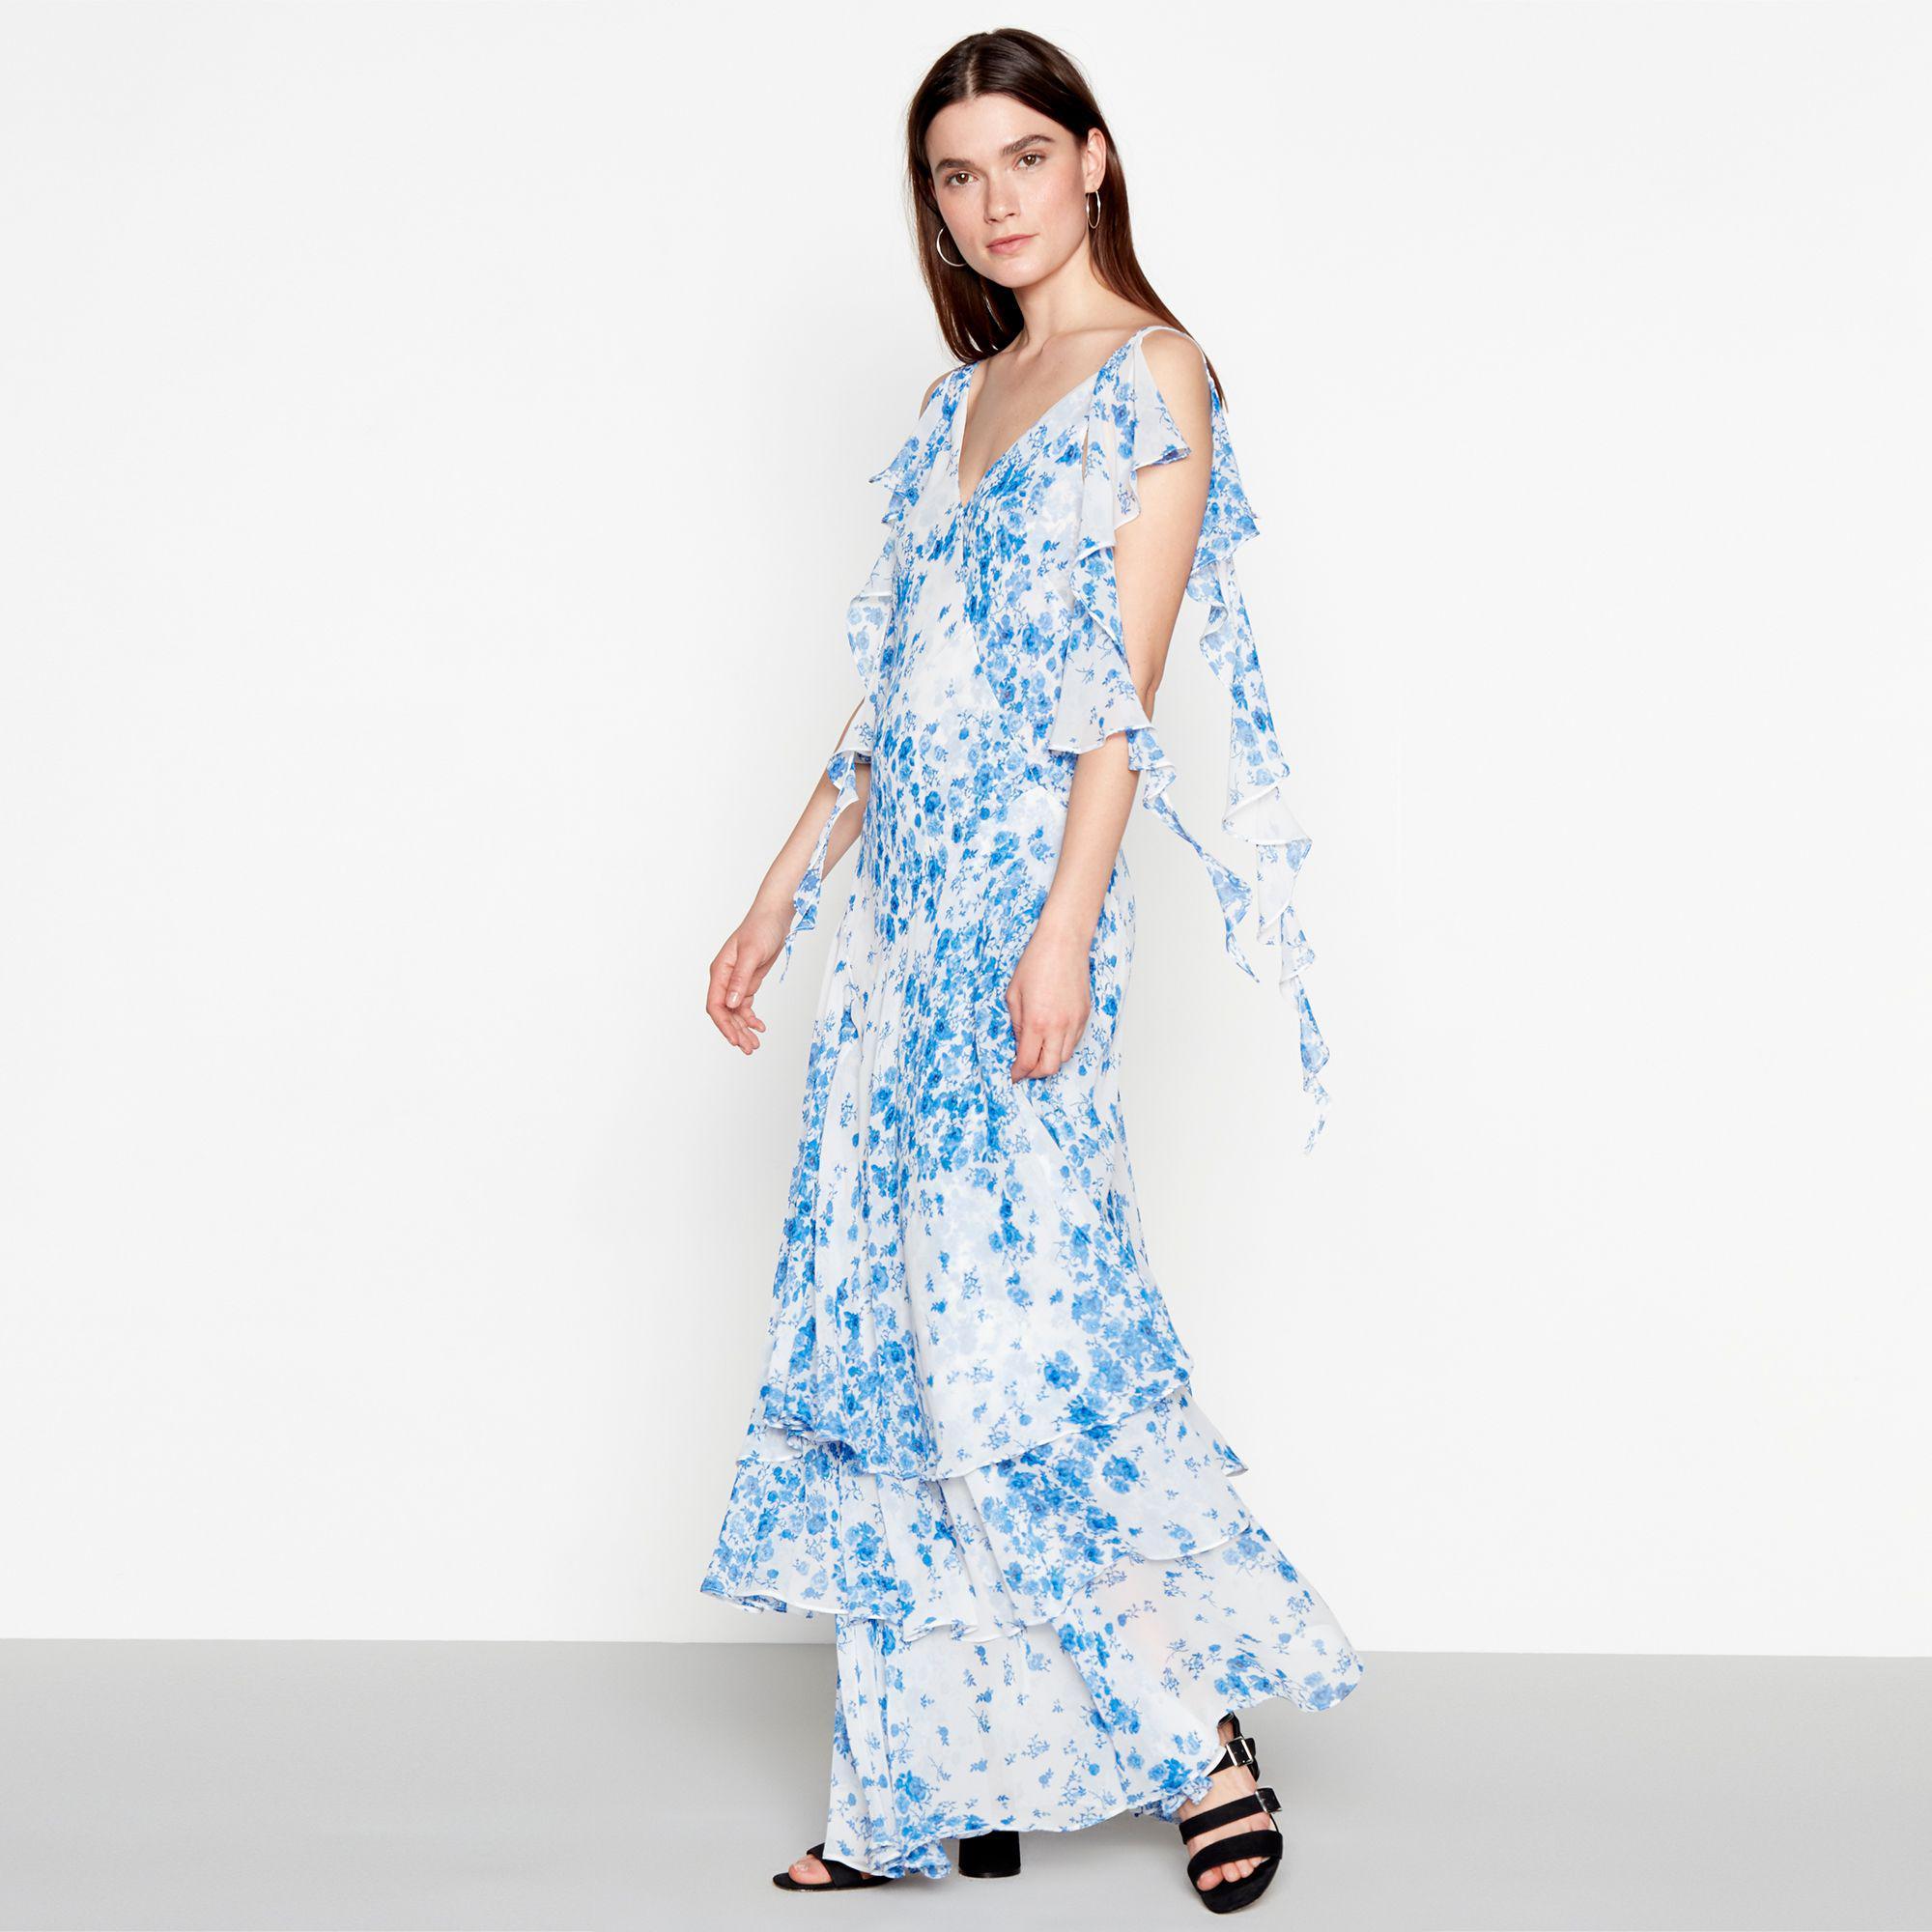 28ded5d21f8e Preen By Thornton Bregazzi Pale Blue Floral Print Chiffon V-neck ...